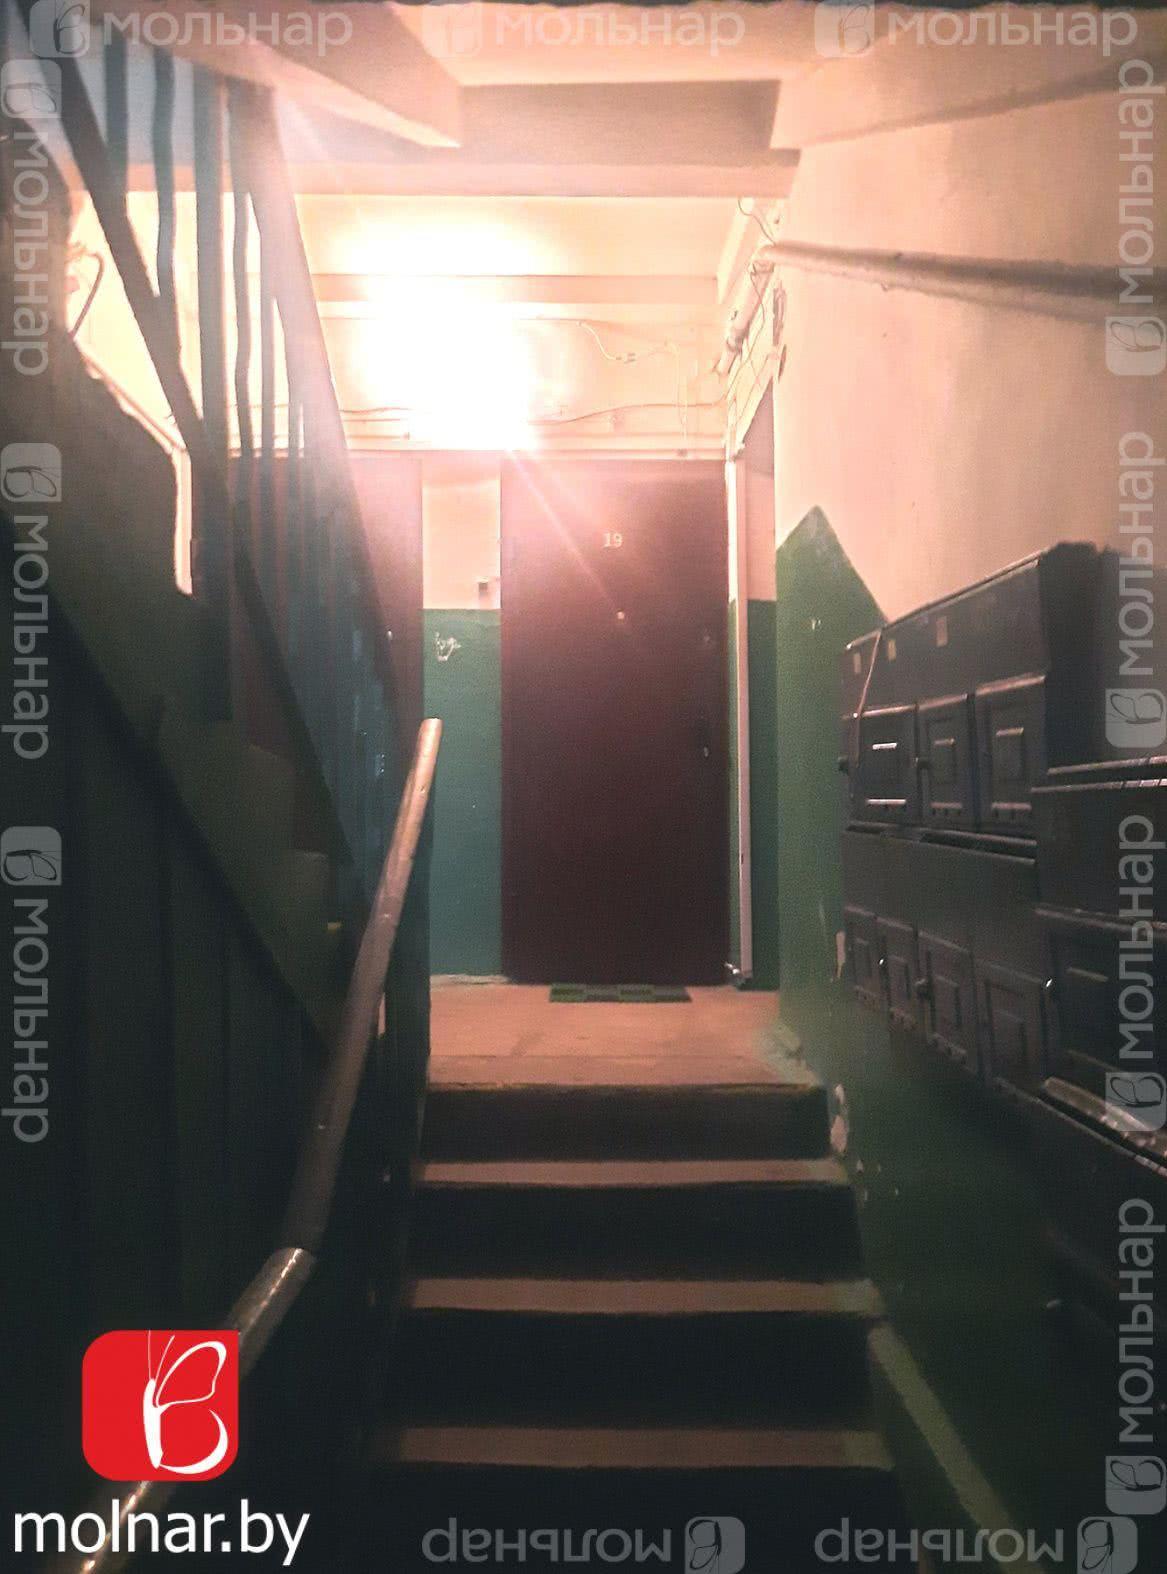 Купить 1-комнатную квартиру в Минске, ул. Маяковского, д. 188 - фото 6